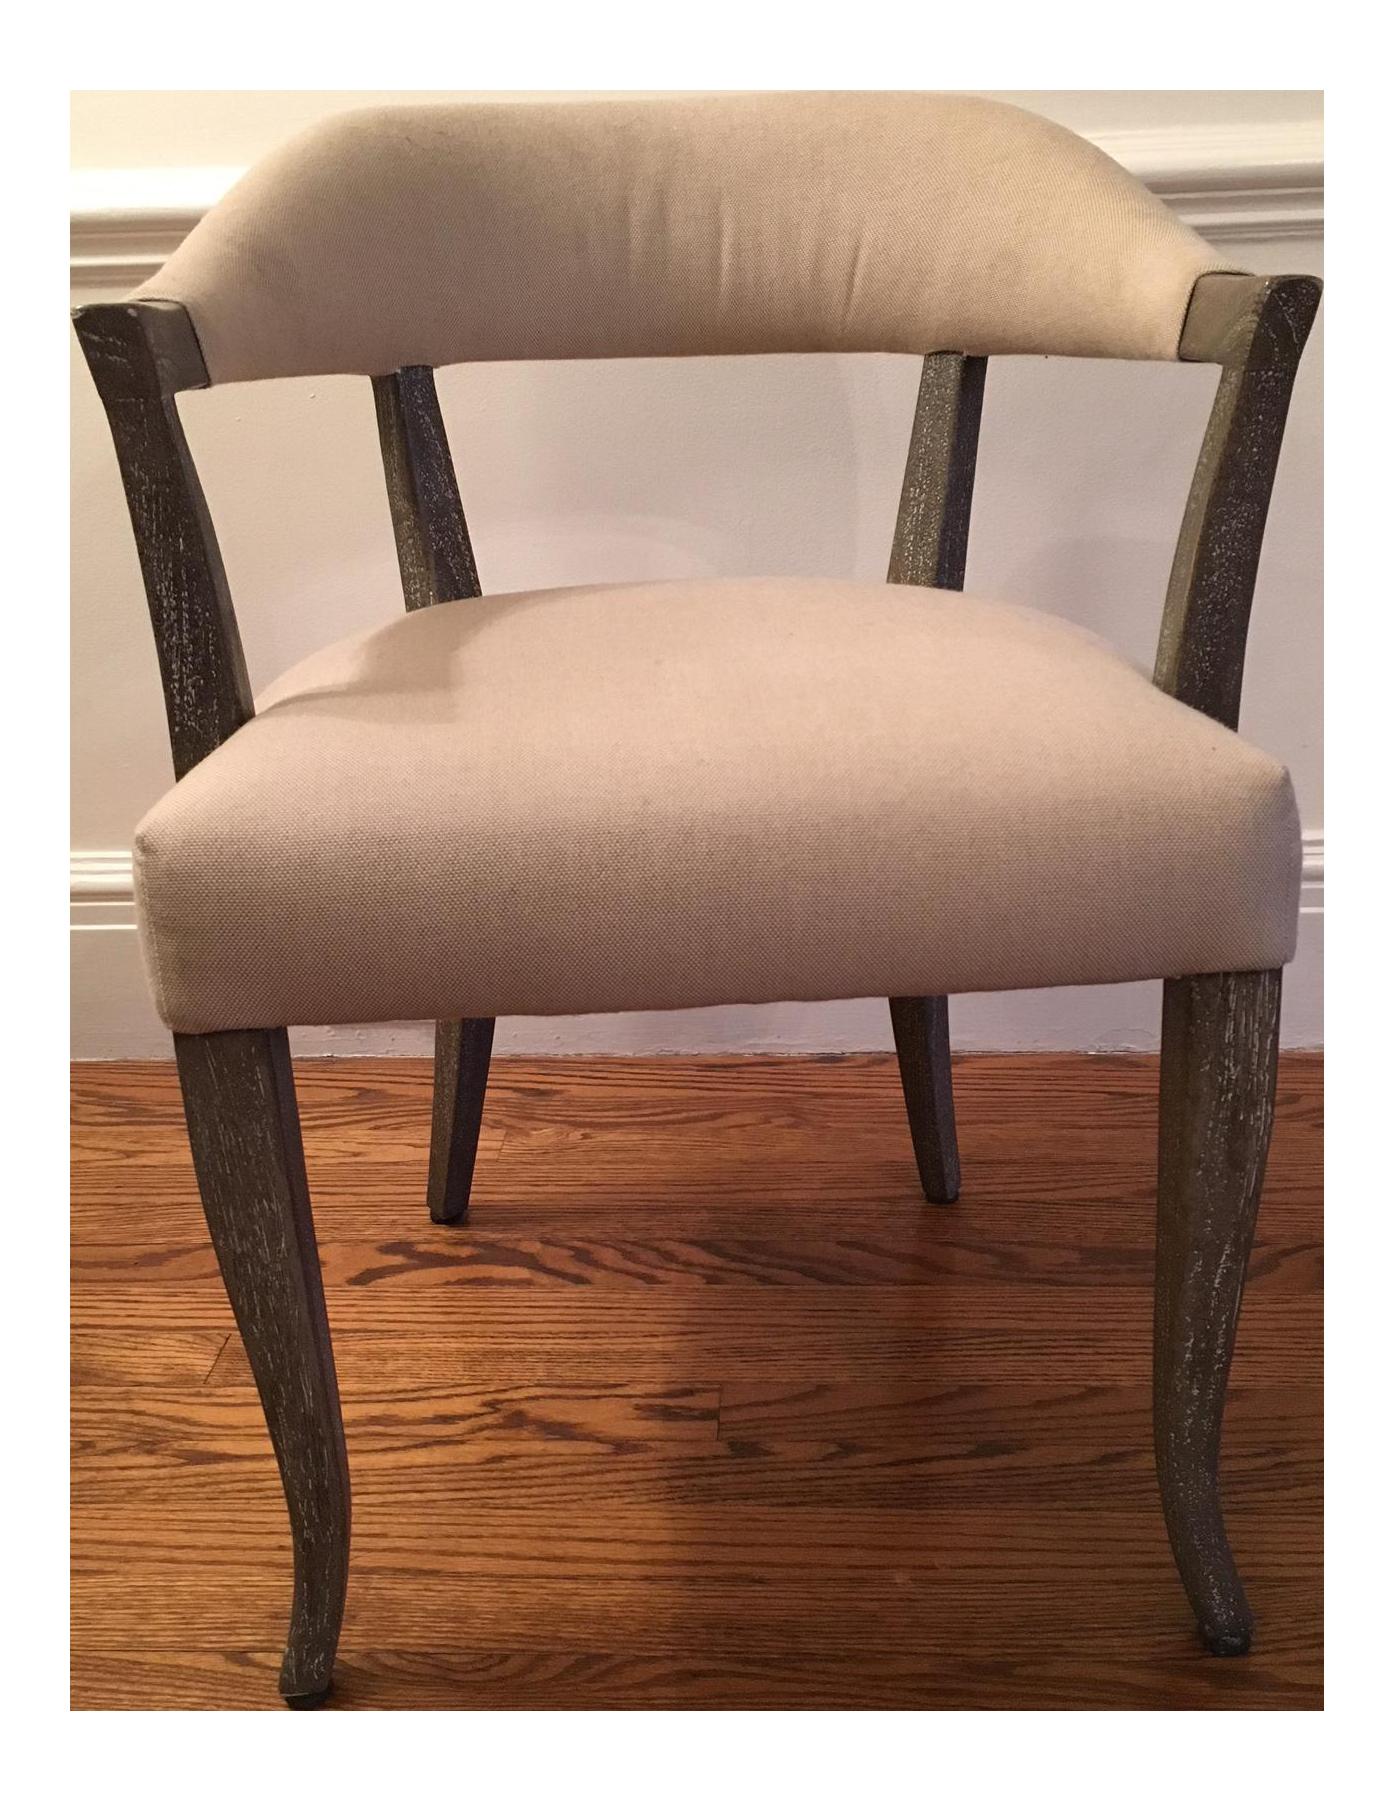 Palecek Menlo Dinng Chair For Sale